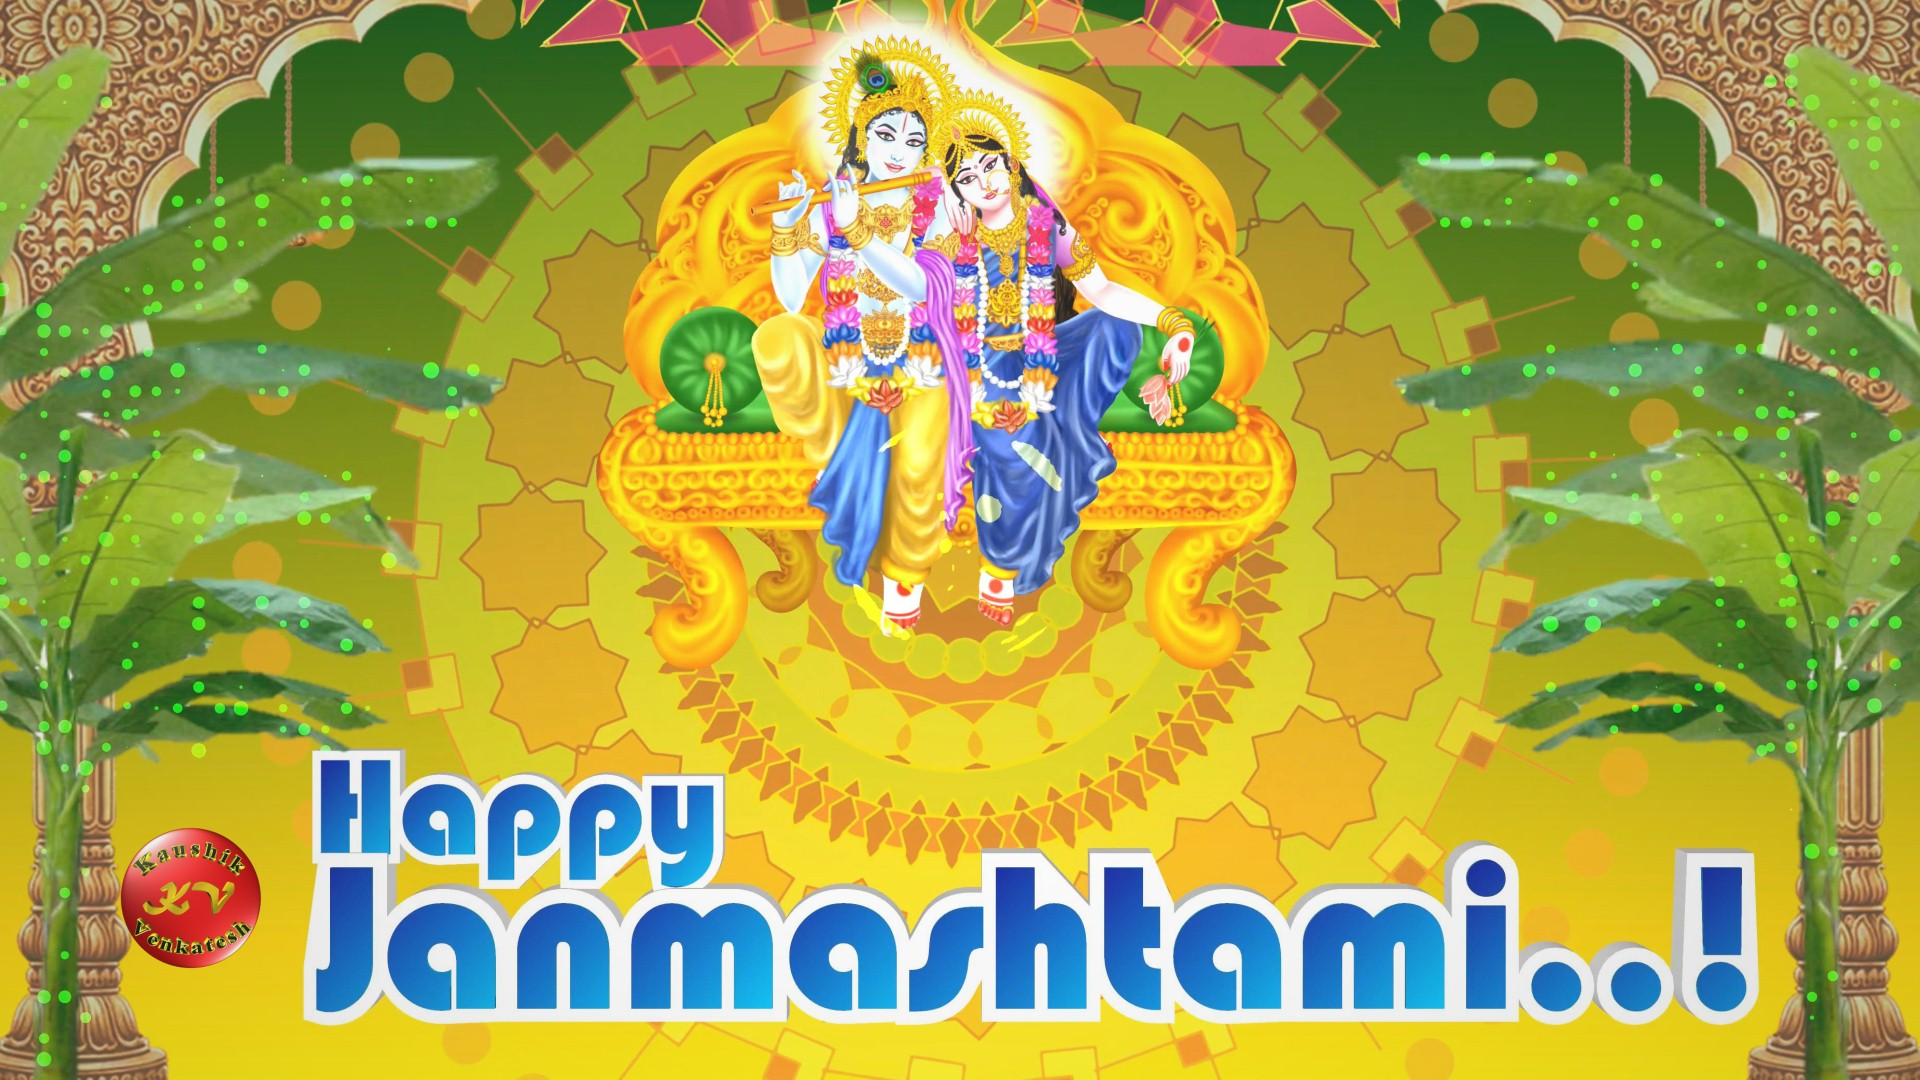 Latest Greetings Image of Krishna Janmashtami Video Greetings